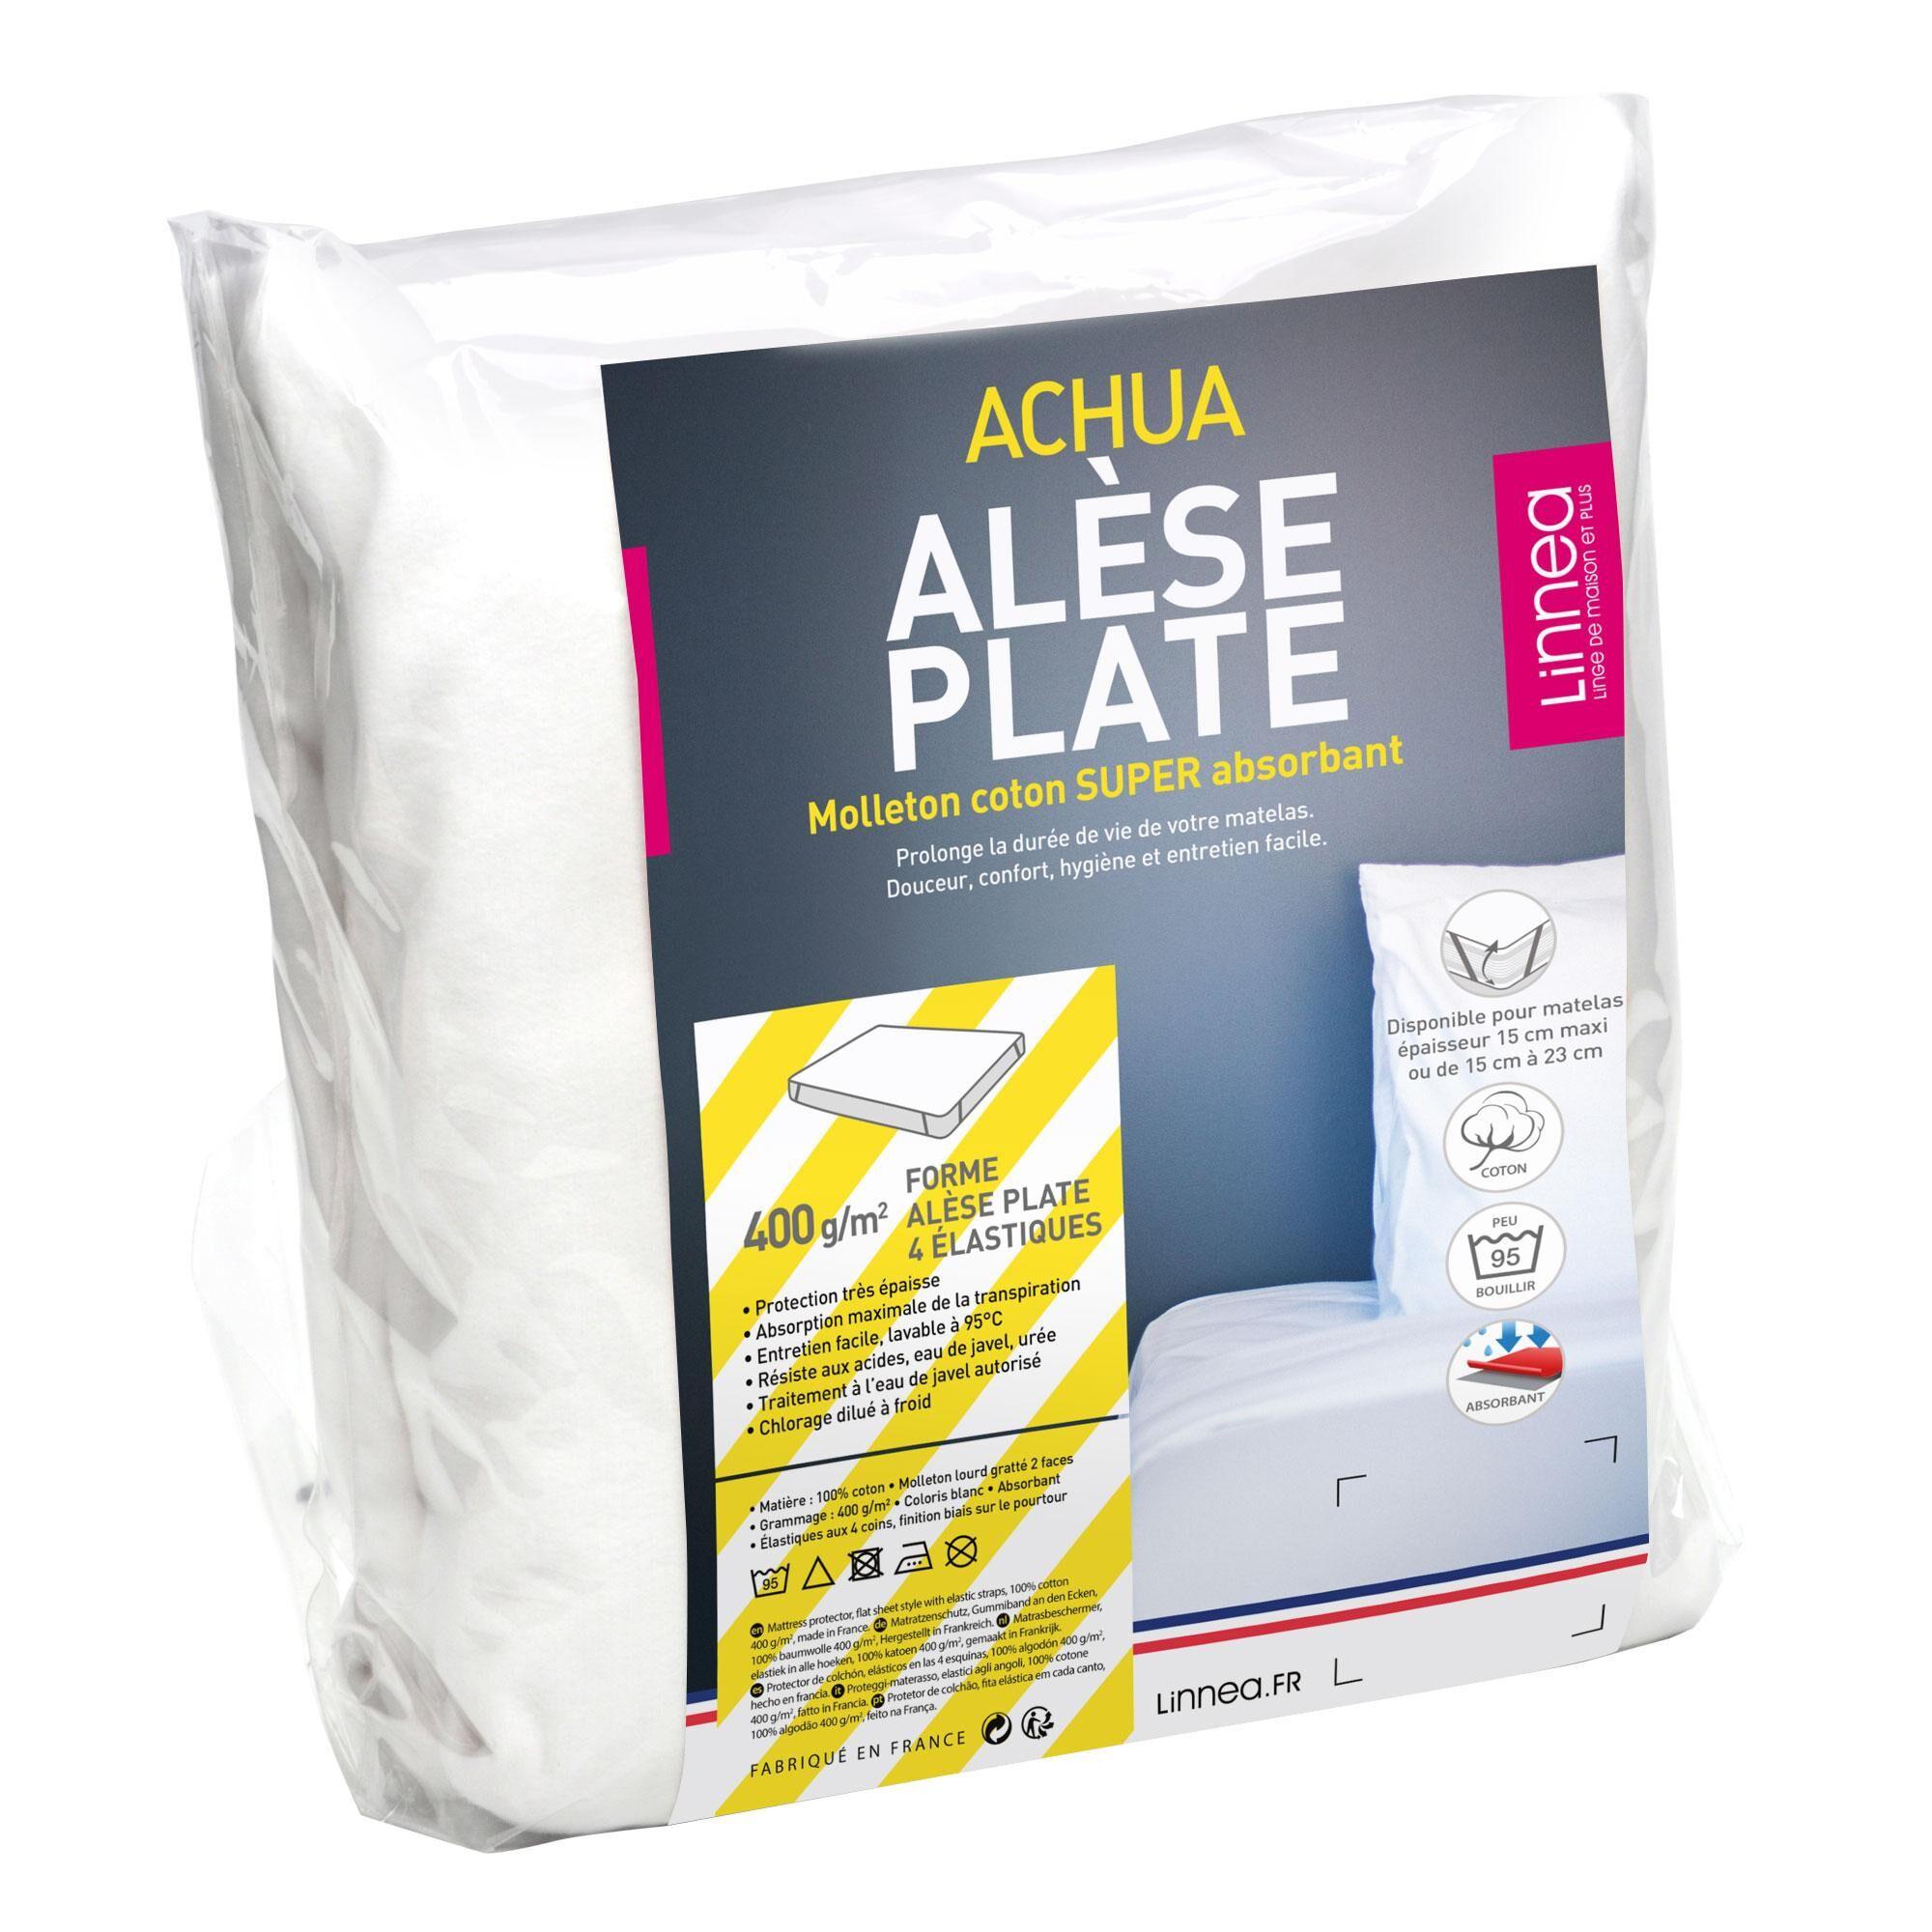 Linnea Alèse plate 70x150 cm ACHUA Molleton 100% coton 400 g/m2 matelas 15cm maxi